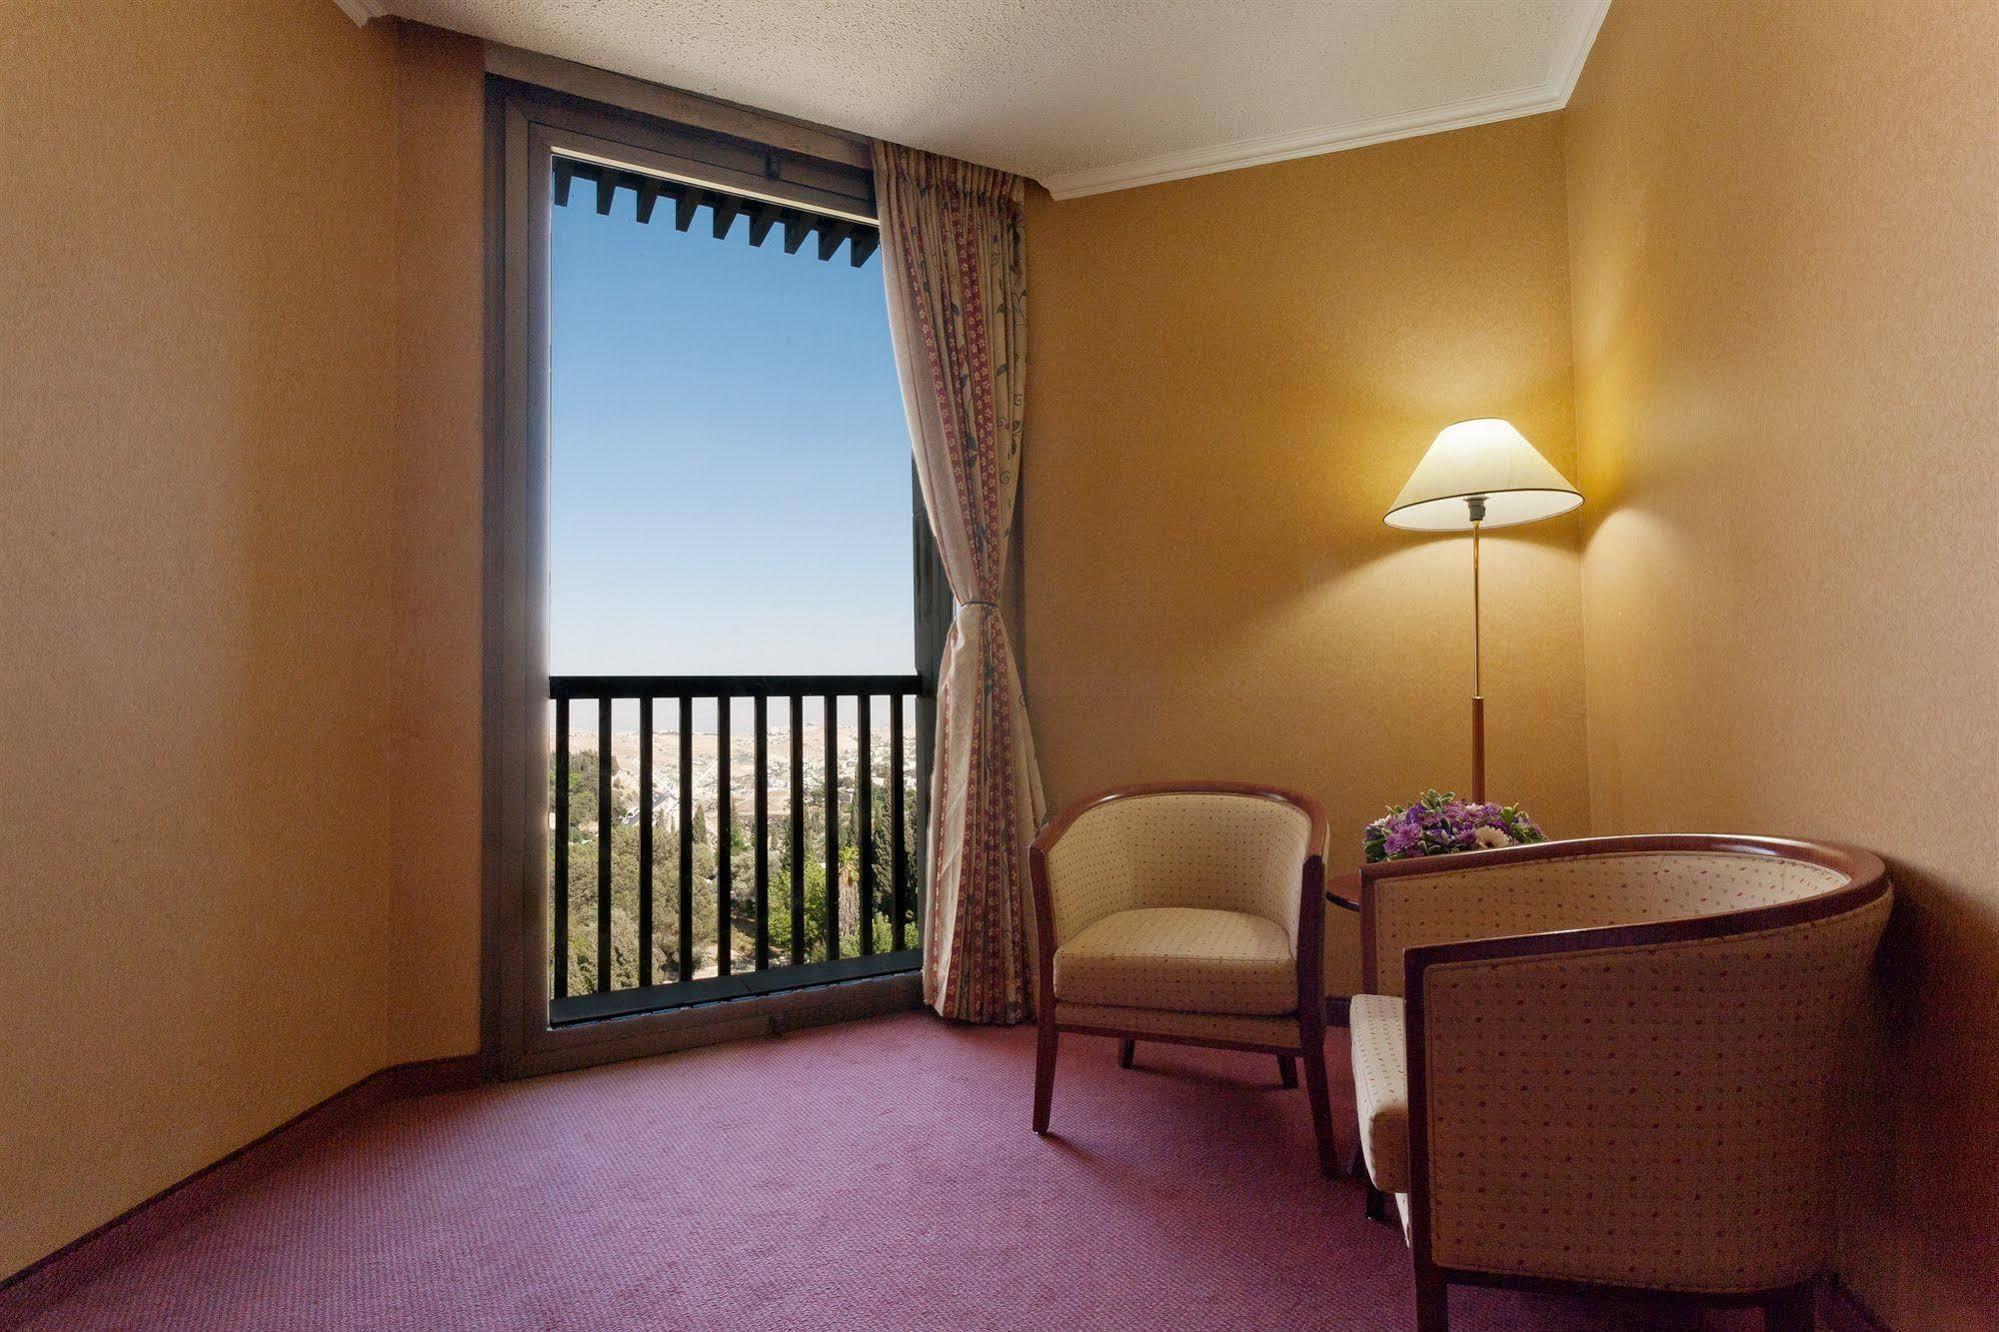 King Solomon Hotel Jerusalem Image 19